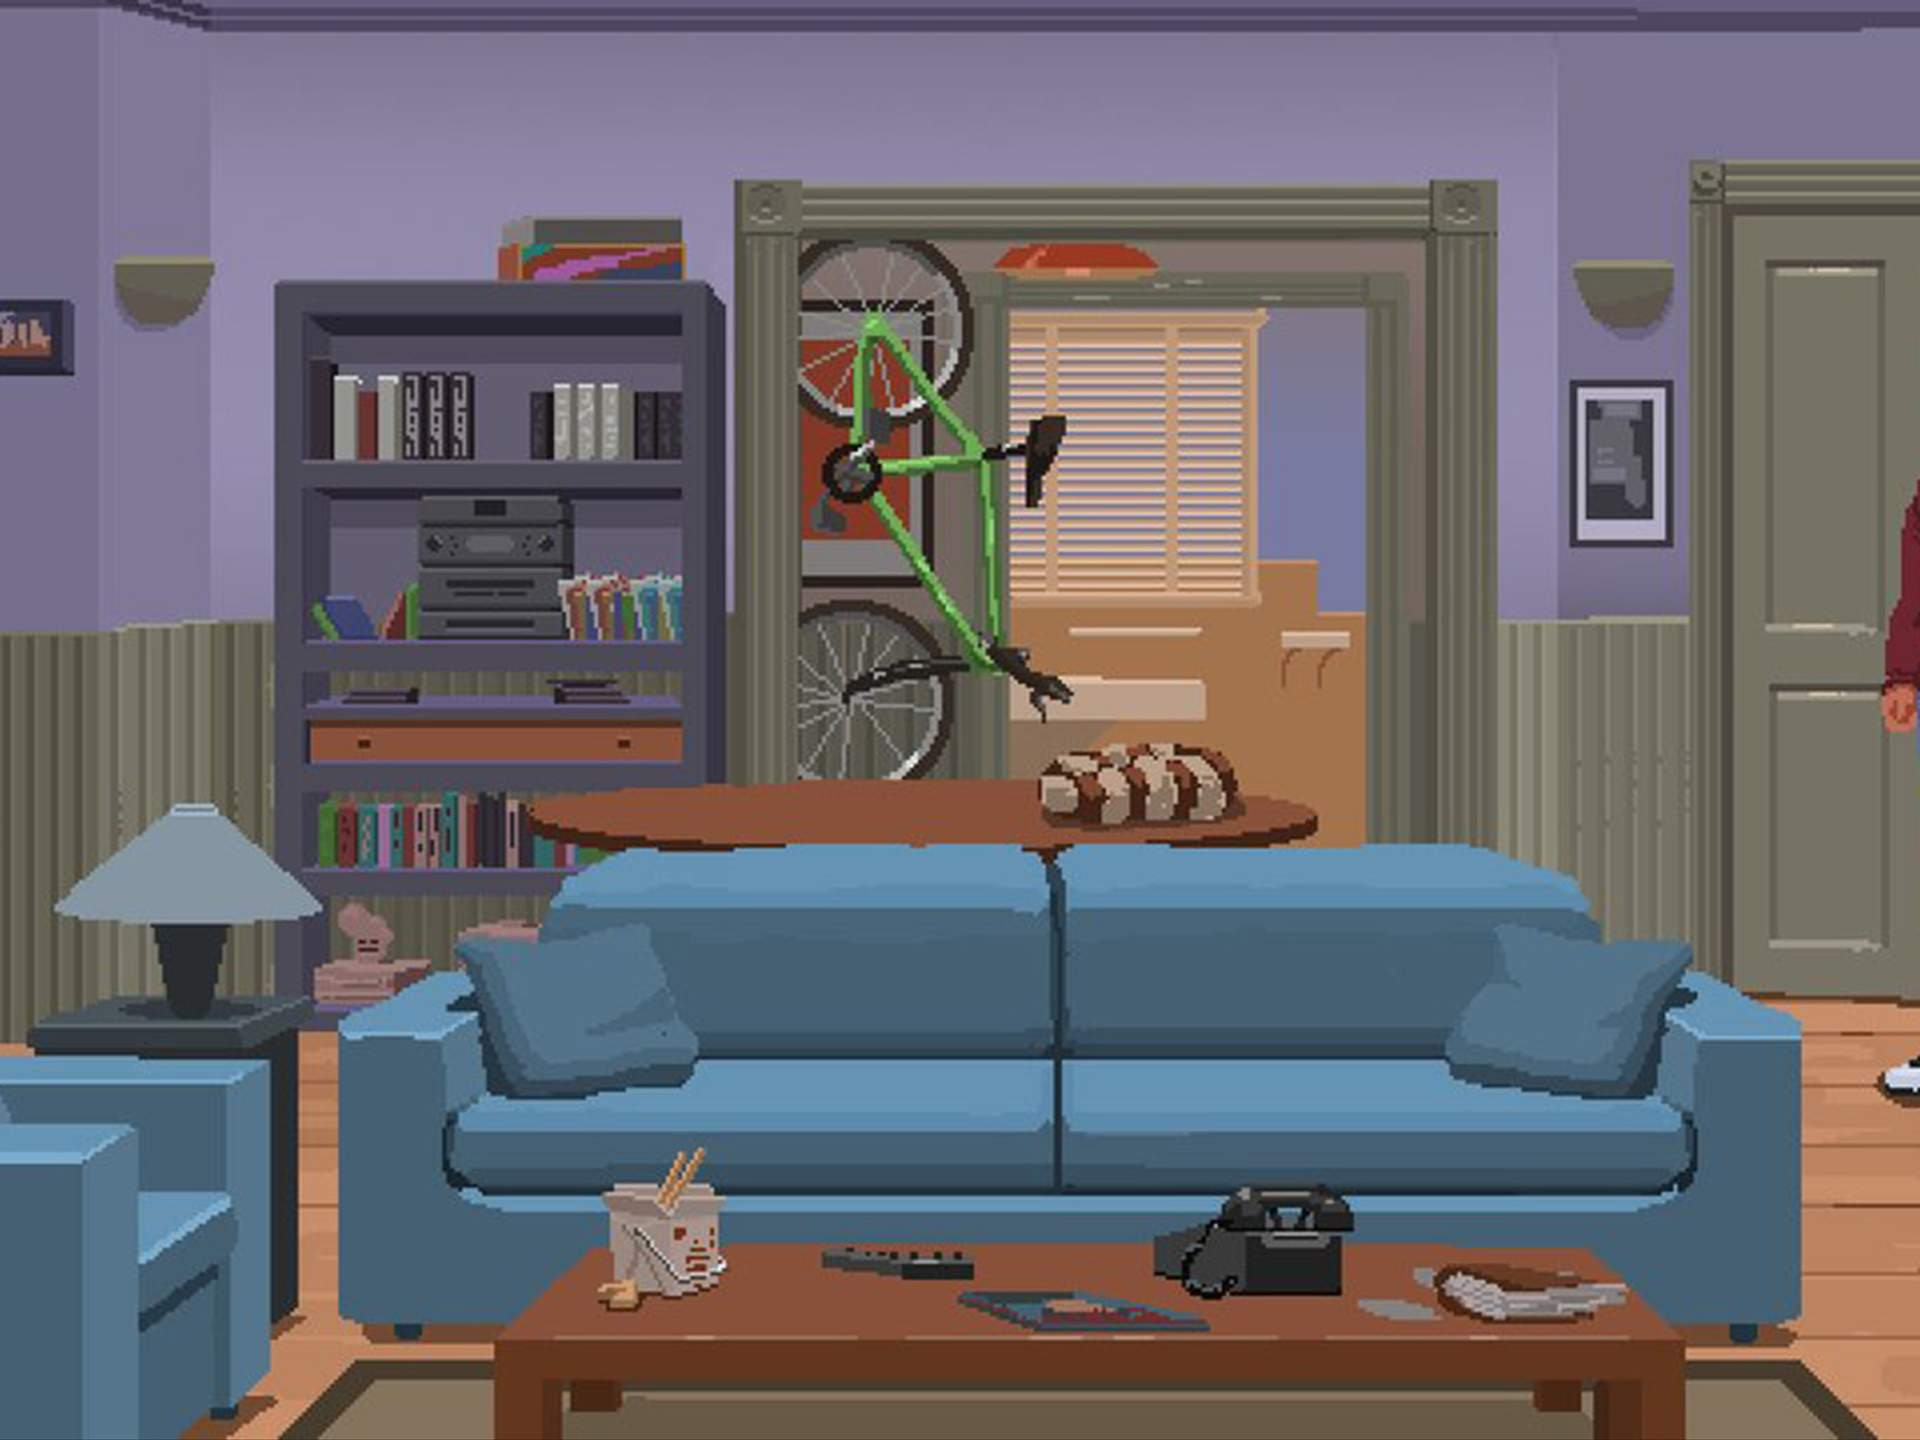 Seinfeld-game_-Jacob-Janerka_twitter-1920x1440